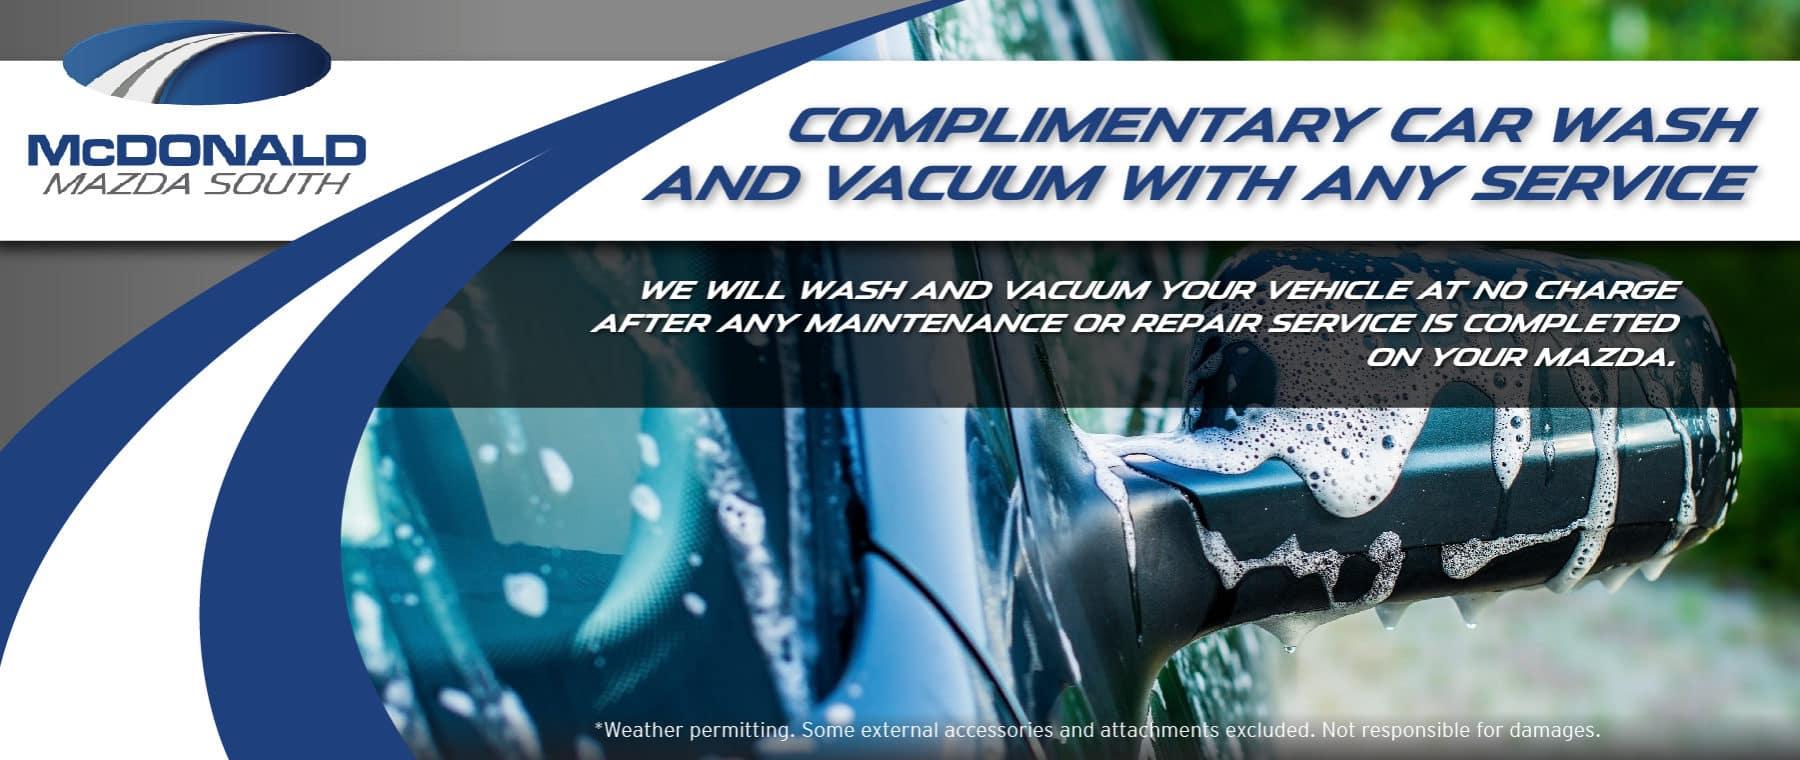 Wash and Vacuum